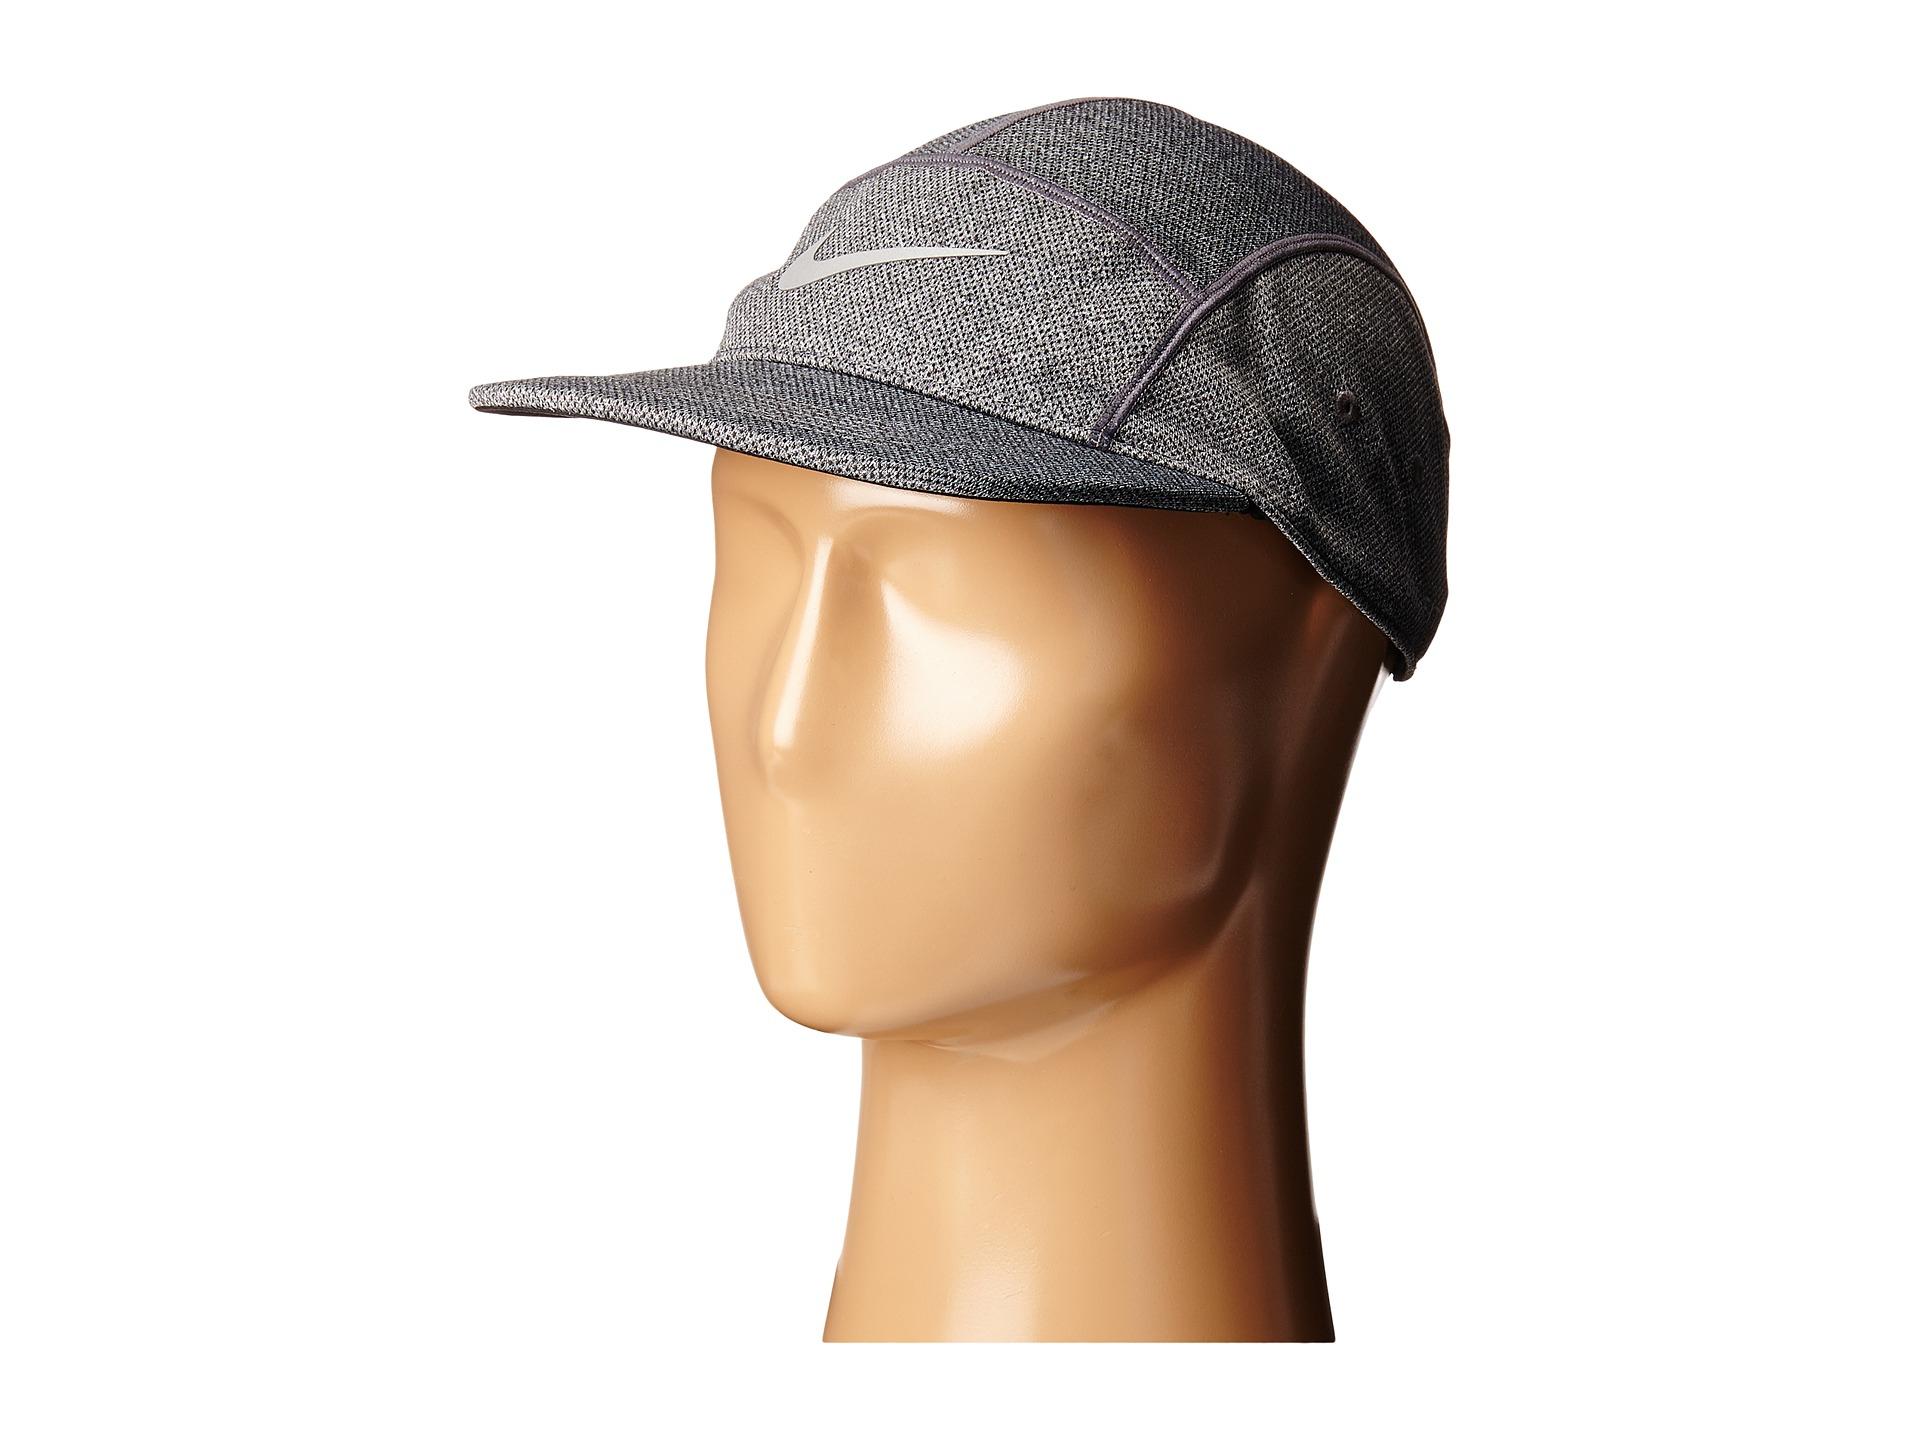 bc345230fc70fc ... discount lyst nike run dri fit knit aw84 hat in metallic for men eec4e  e8fa9